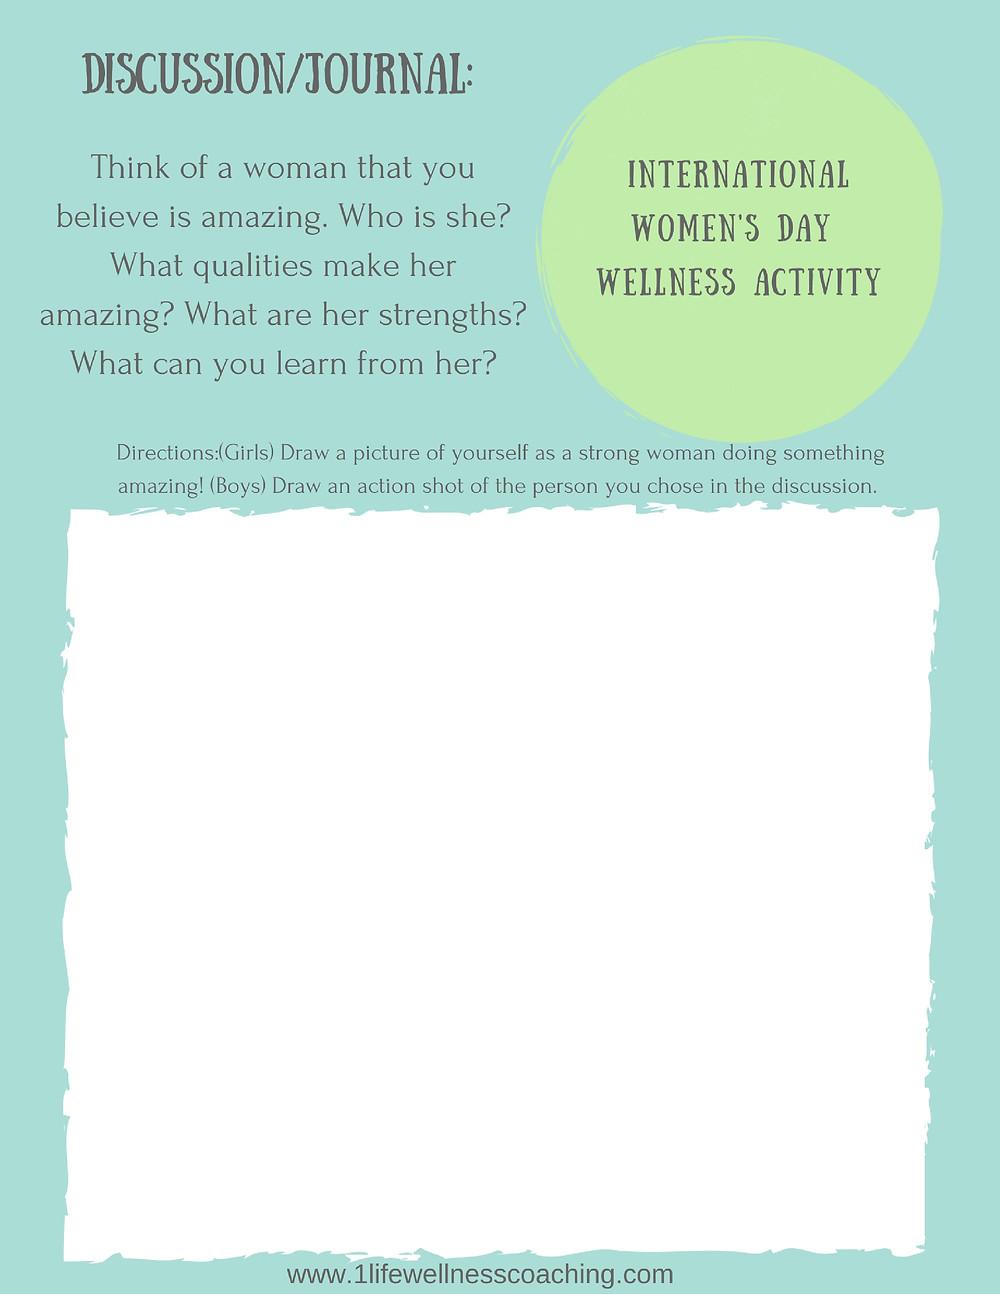 Free Women's Day Wellness Activity